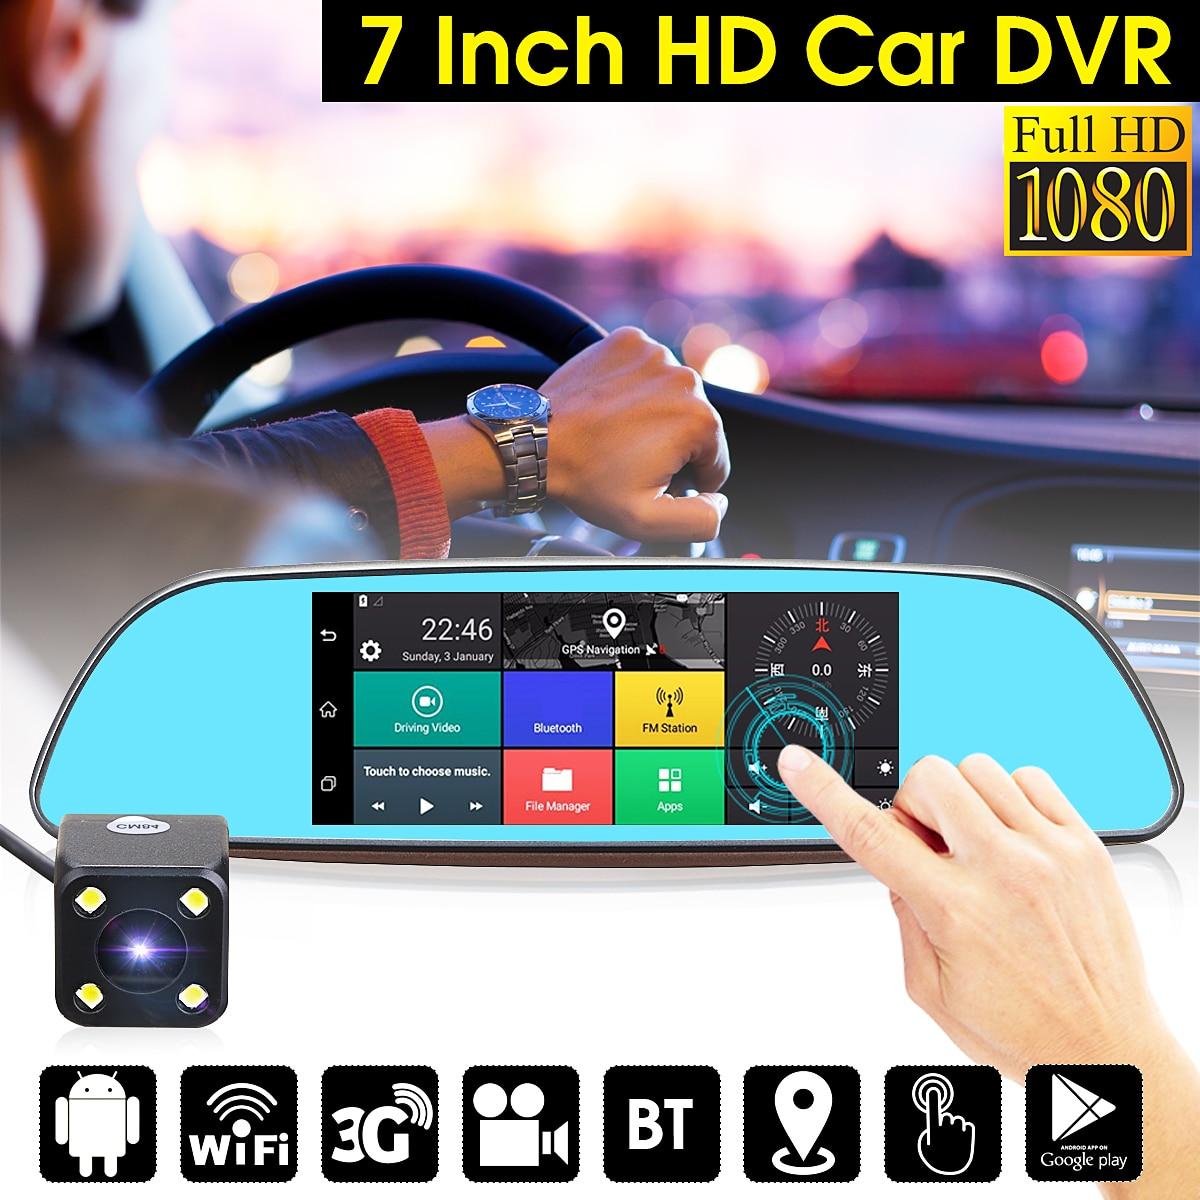 7 Car DVR Mirror Camera Android 5.0 Wifi GPS Full HD 1080P Video Recorder Dual Lens Registrar Rear View Dvrs Dash Cam podofo 7 car dvr mirror camera full hd 1080p video recorder dual lens registrar rear view dvrs dash cam auto parking assistance